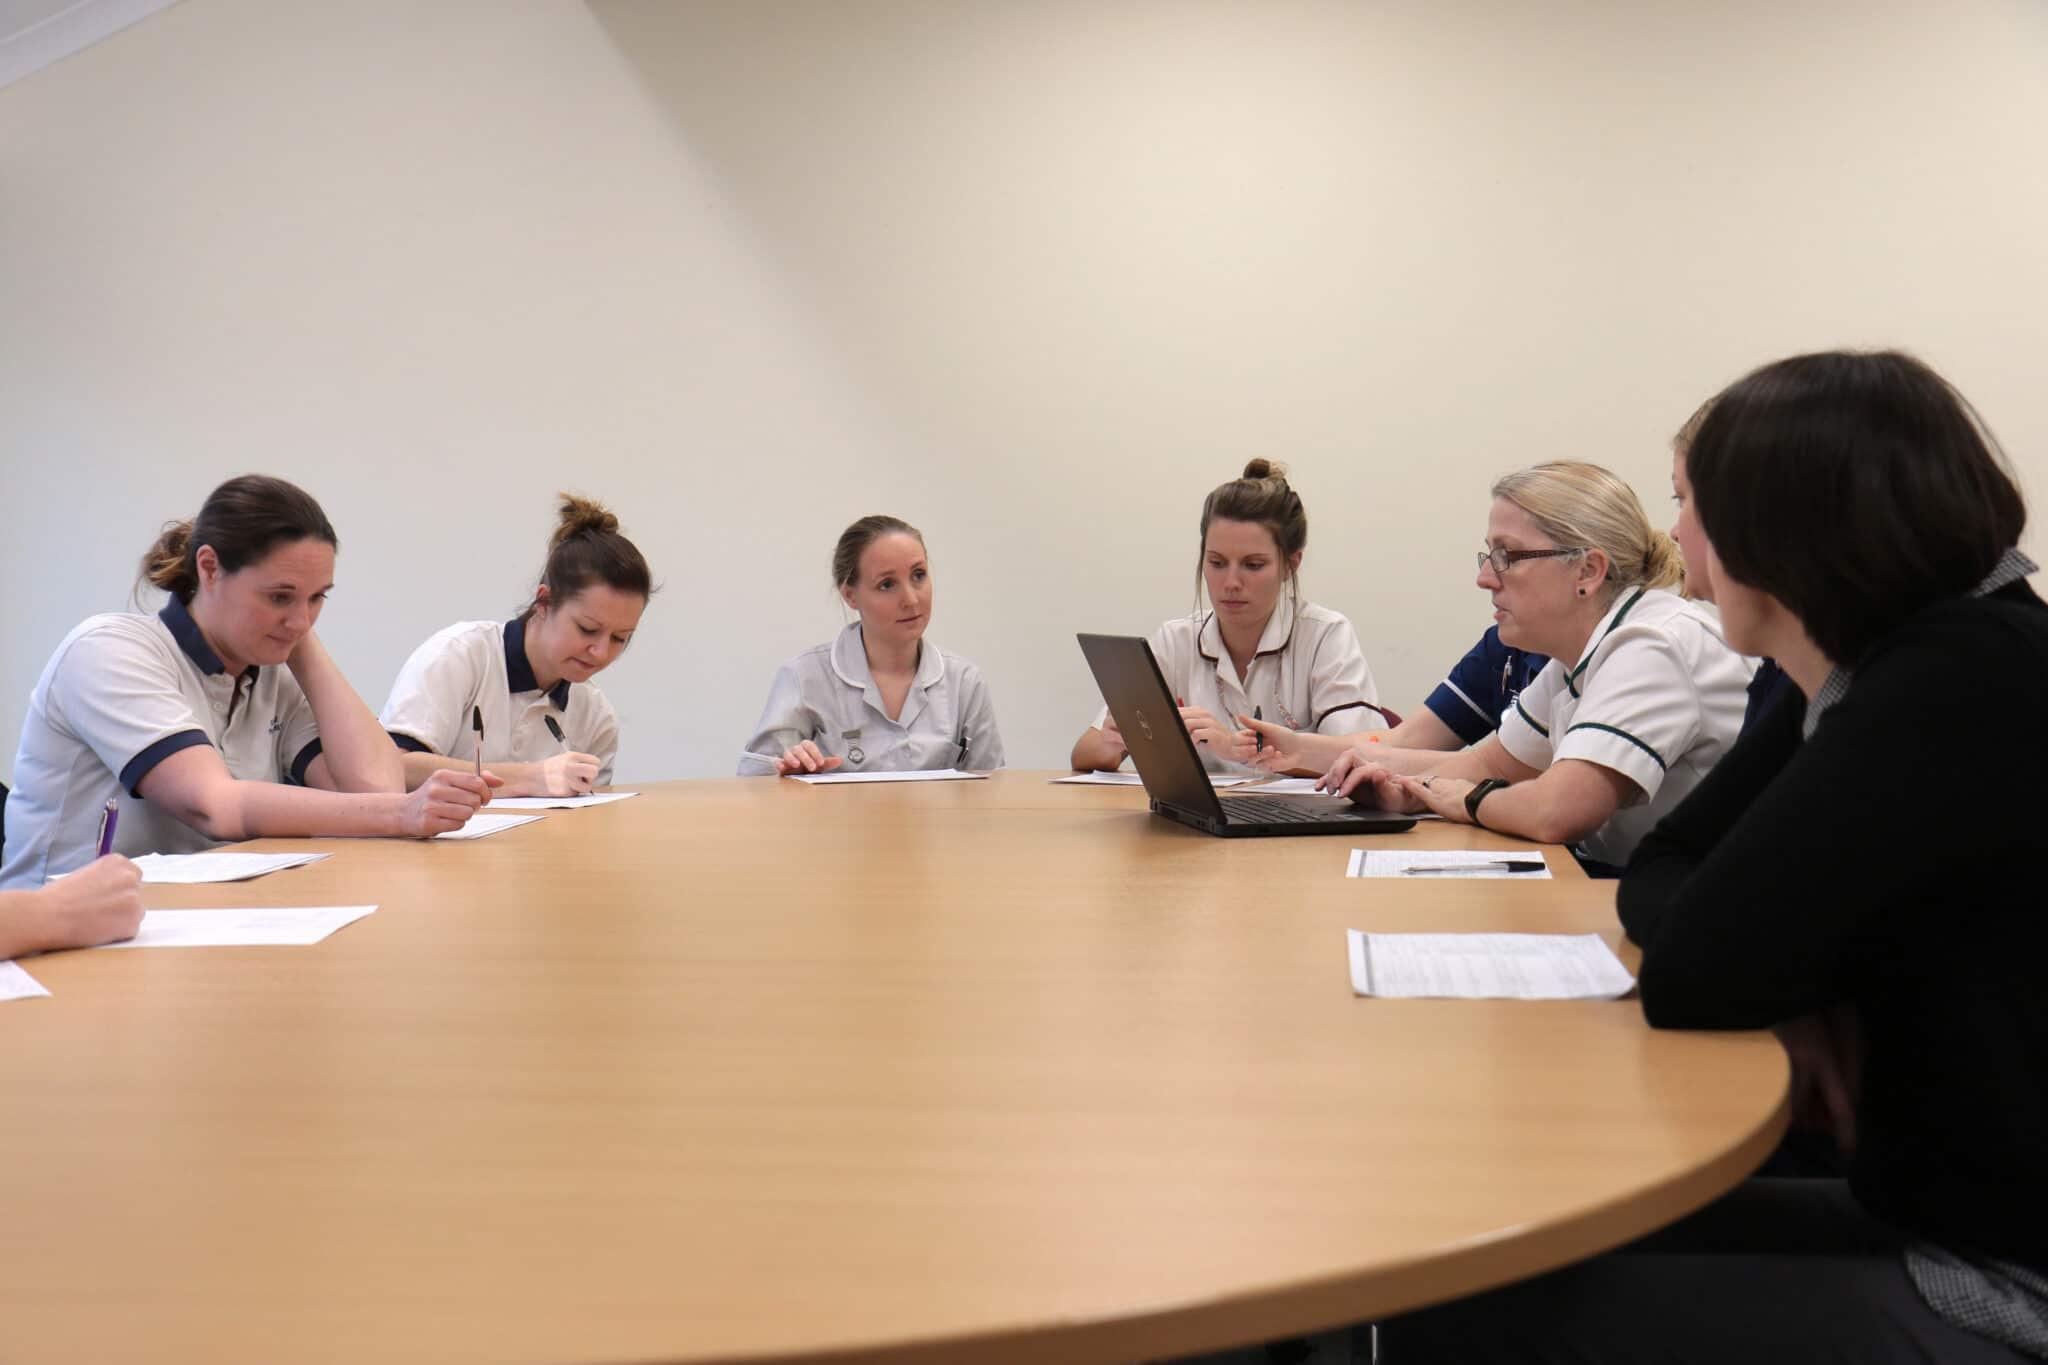 Nurses around a table